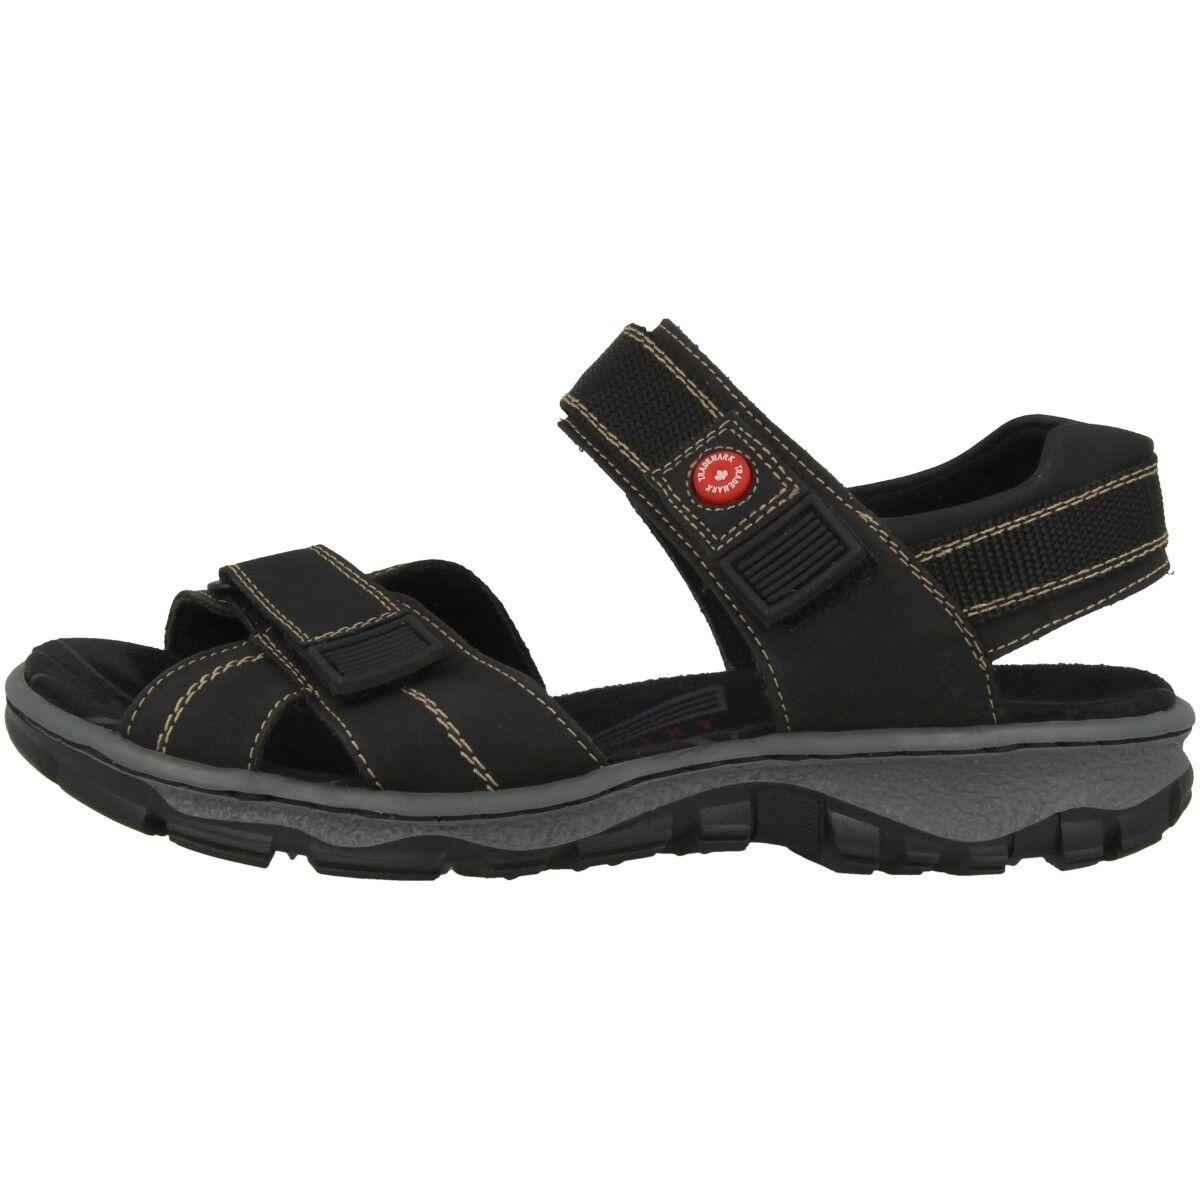 Rieker Rieker Rieker selva-oilybuk zapatos outdoor sandalias anti estrés sandalias 68851-00  Precio por piso